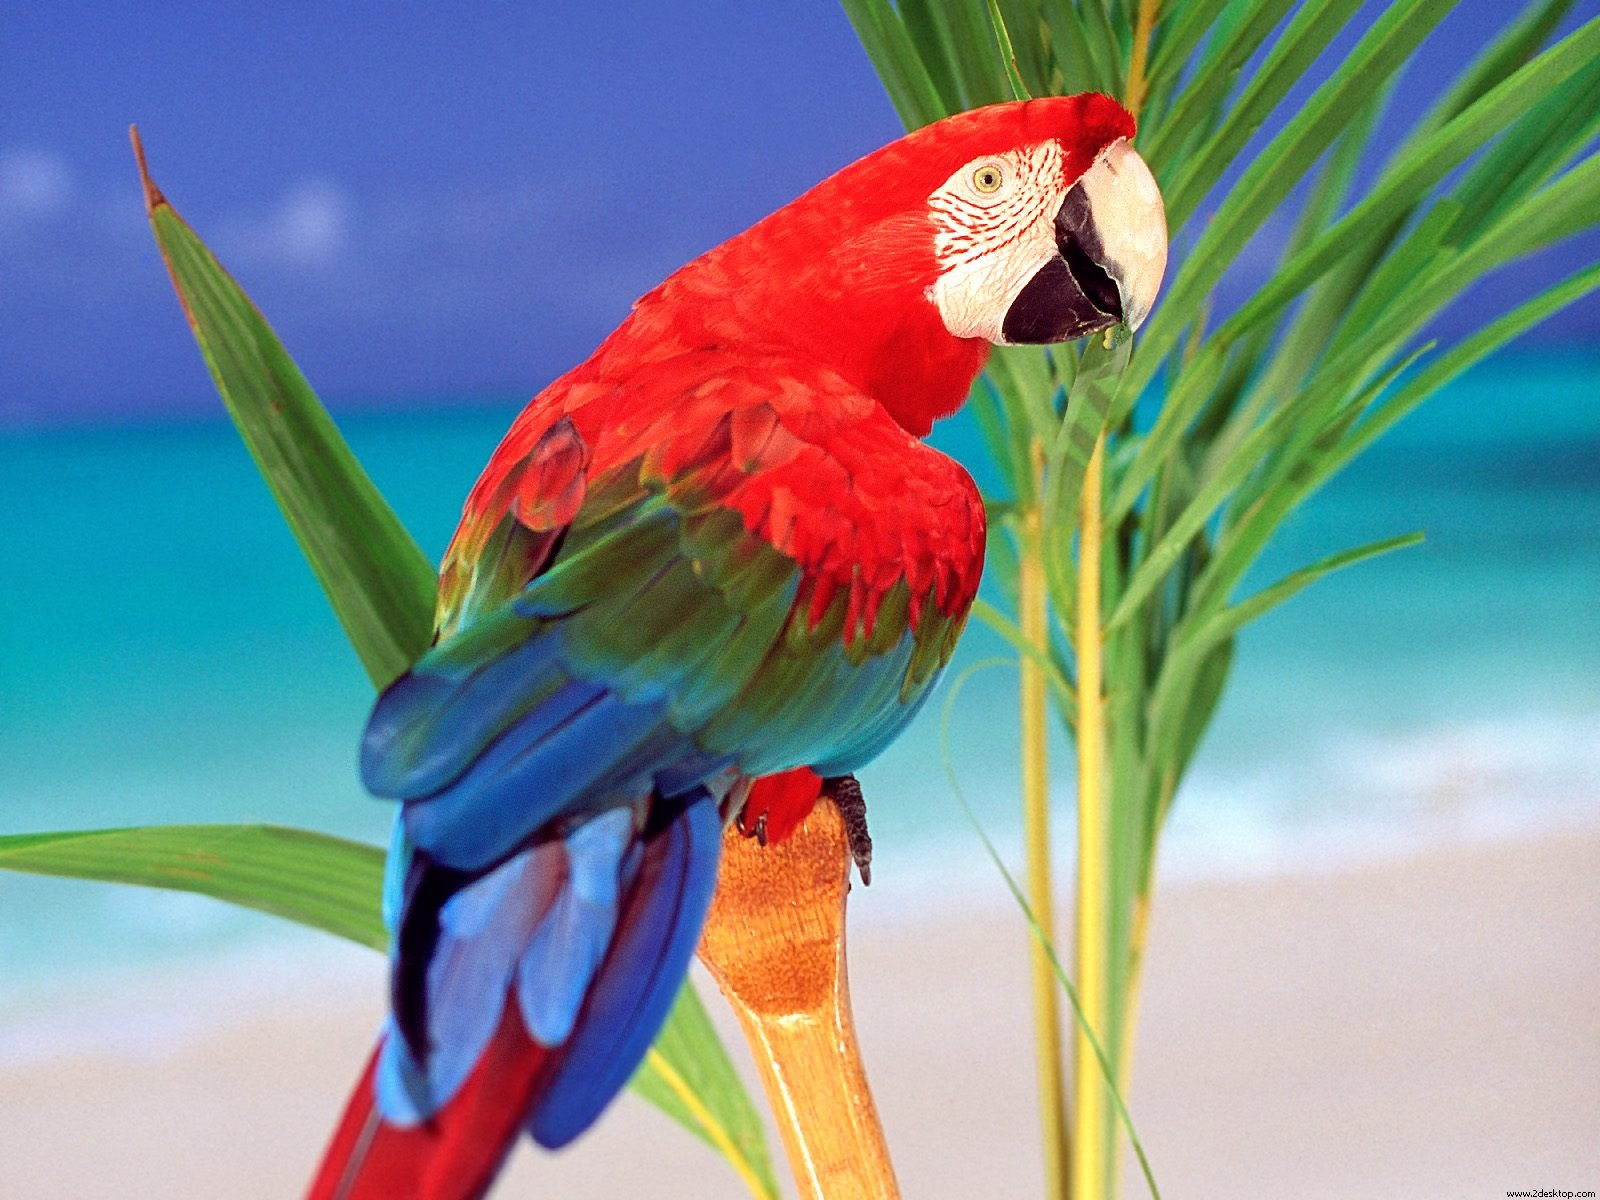 15 beautiful birds latest hd wallpapers 2013 beautiful - Animal and bird hd wallpaper ...